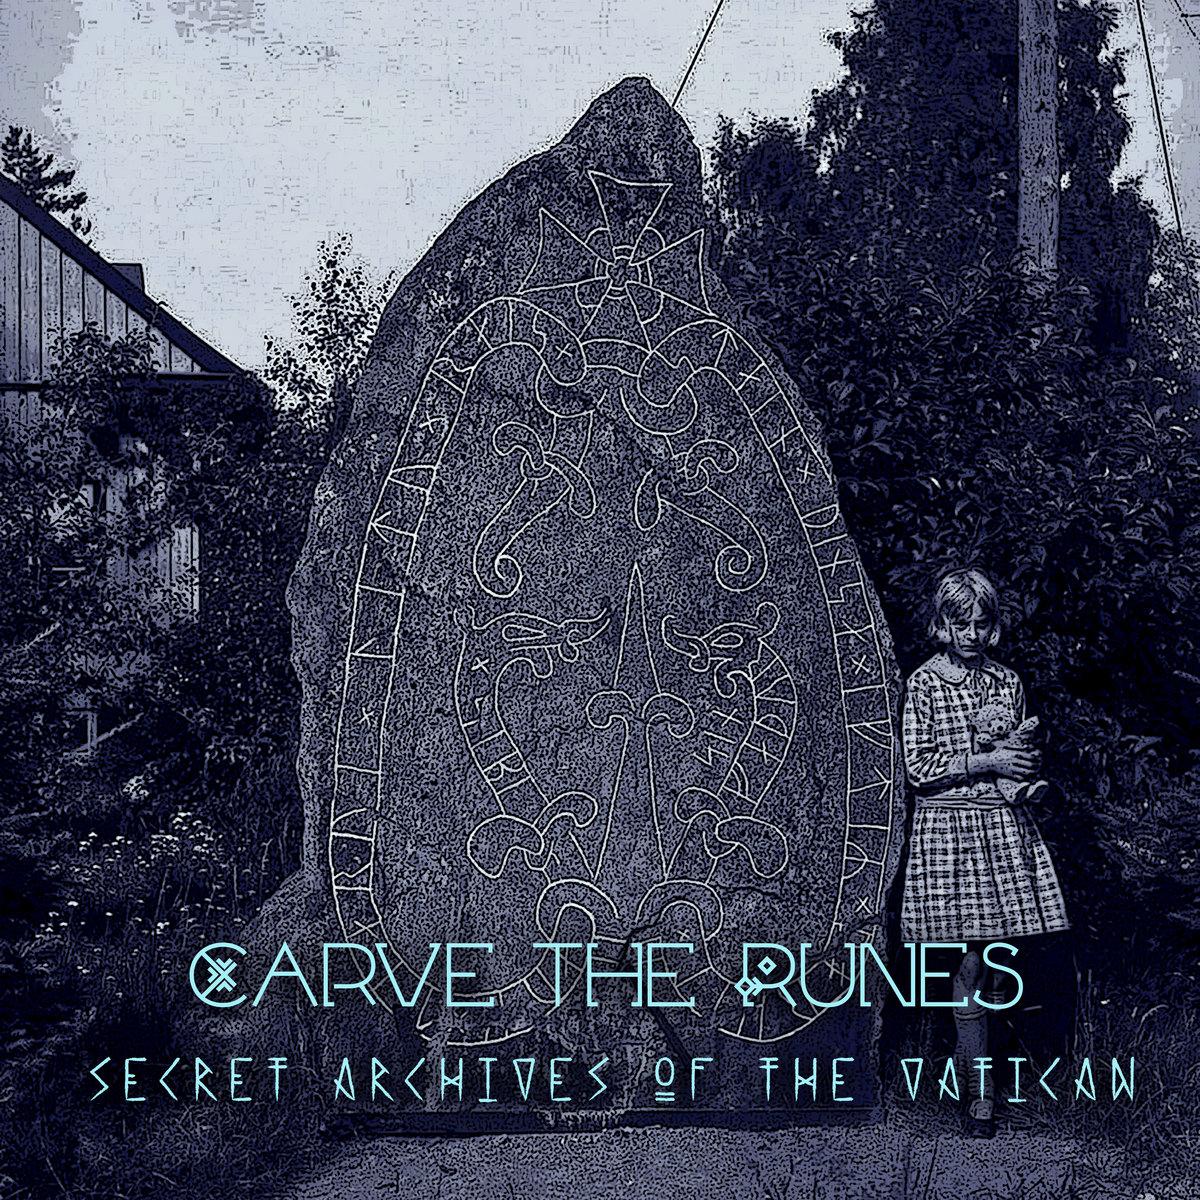 Secret Archives of the Vatican – Carve The Runes